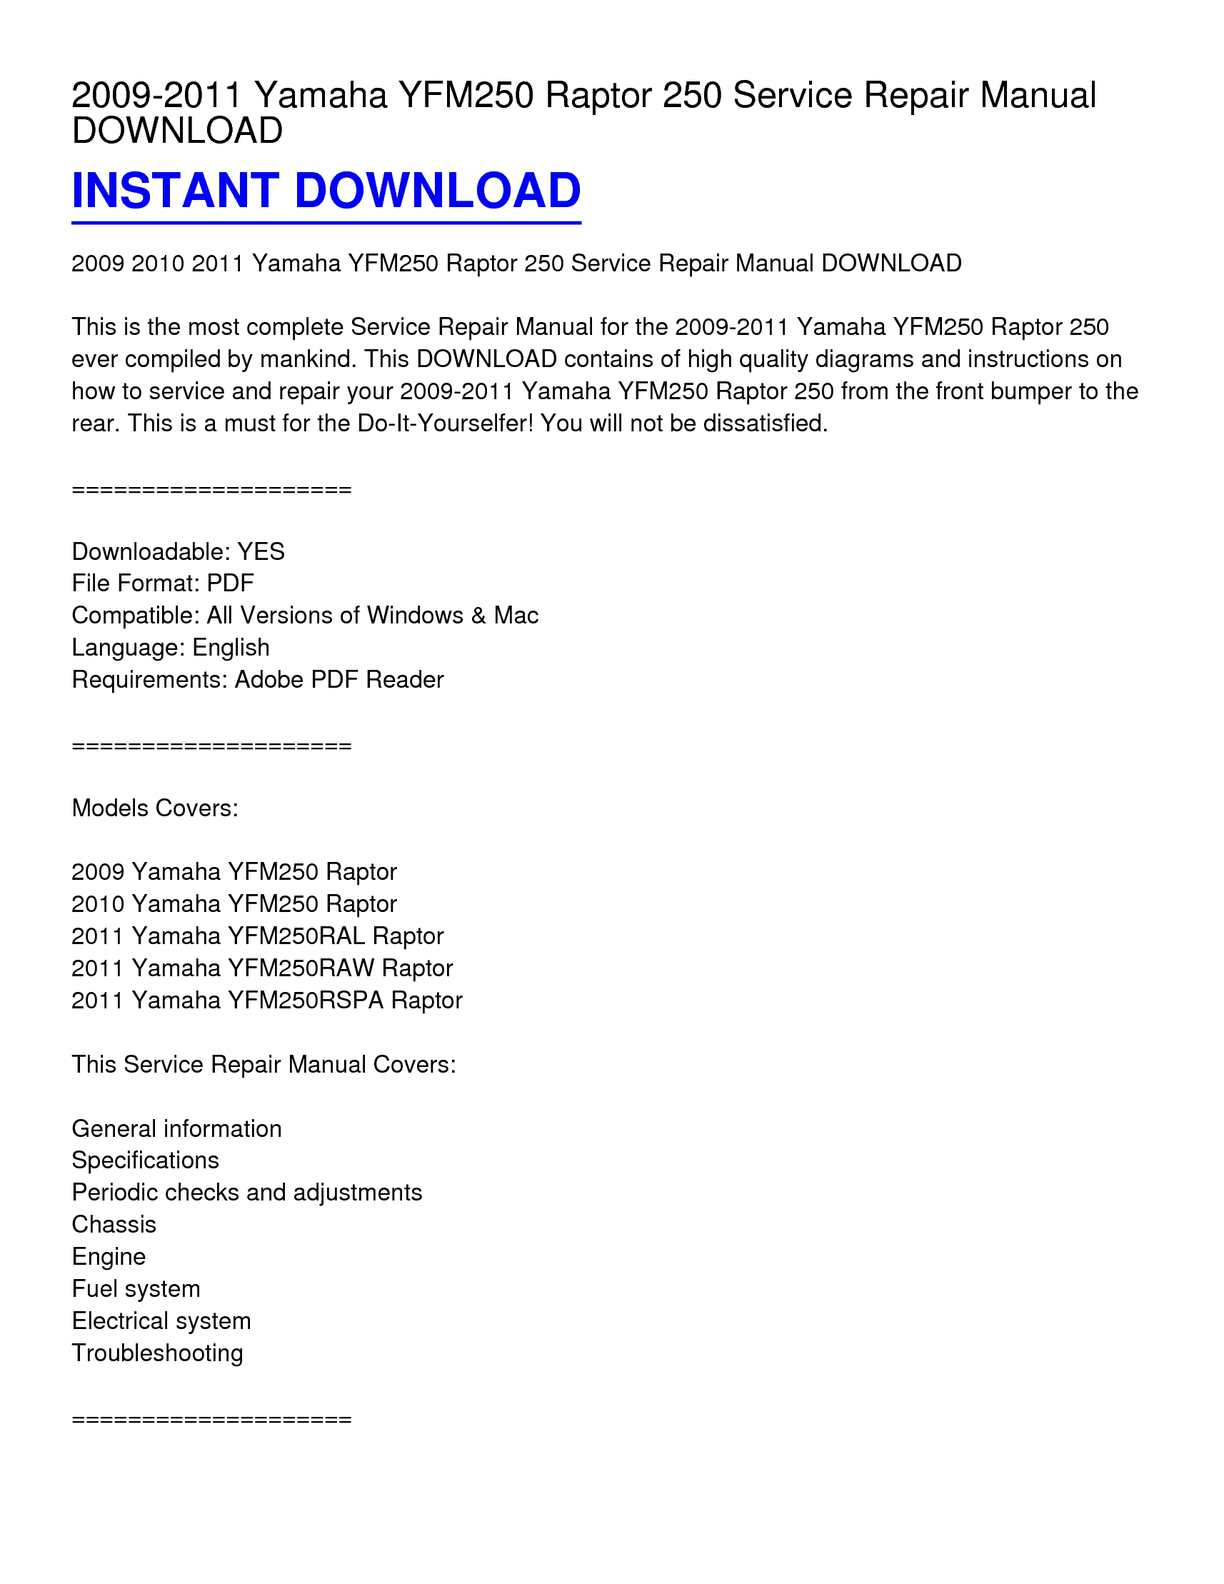 Calamo 2009 2011 Yamaha Yfm250 Raptor 250 Service Repair Manual Yfm Wiring Diagram Free Picture Download